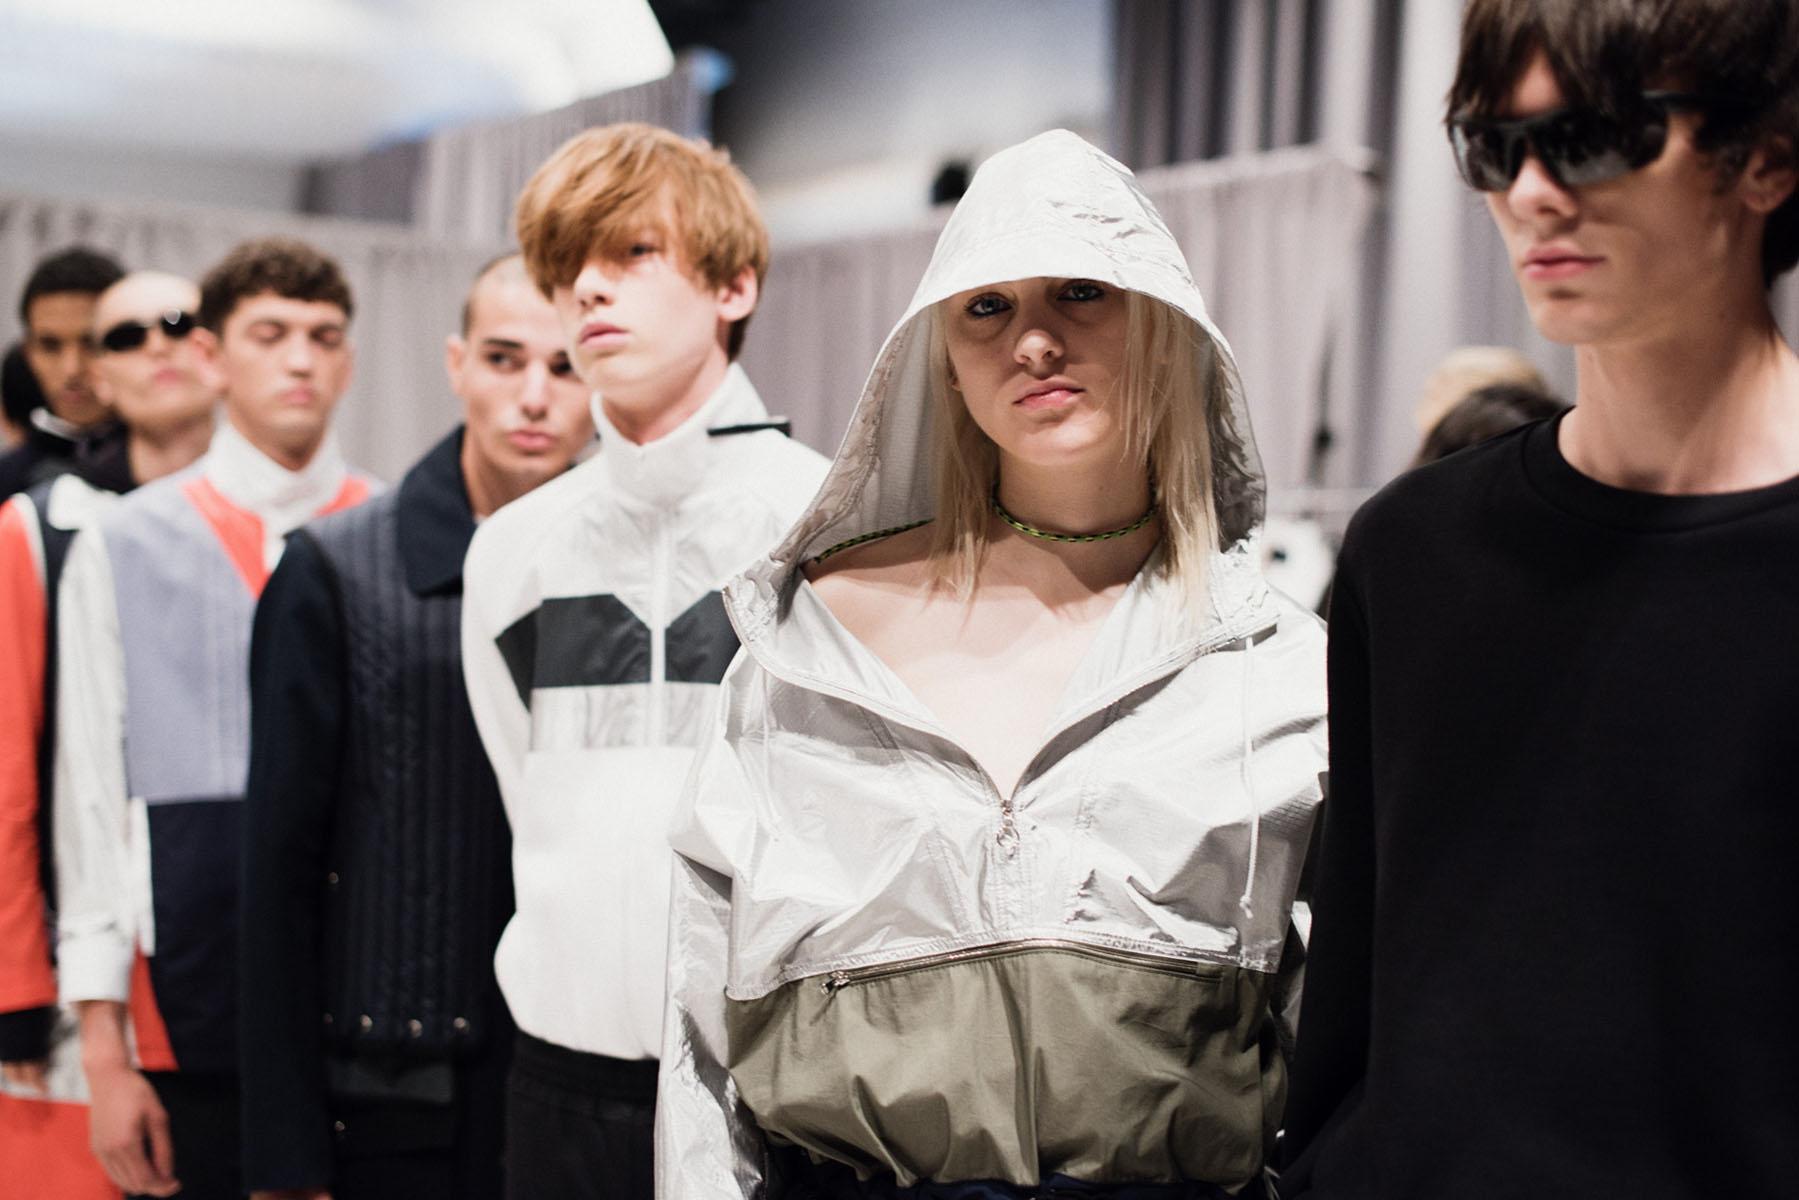 Tim-Coppens-fashion-show-backstage-spring-2017-the-impression-09